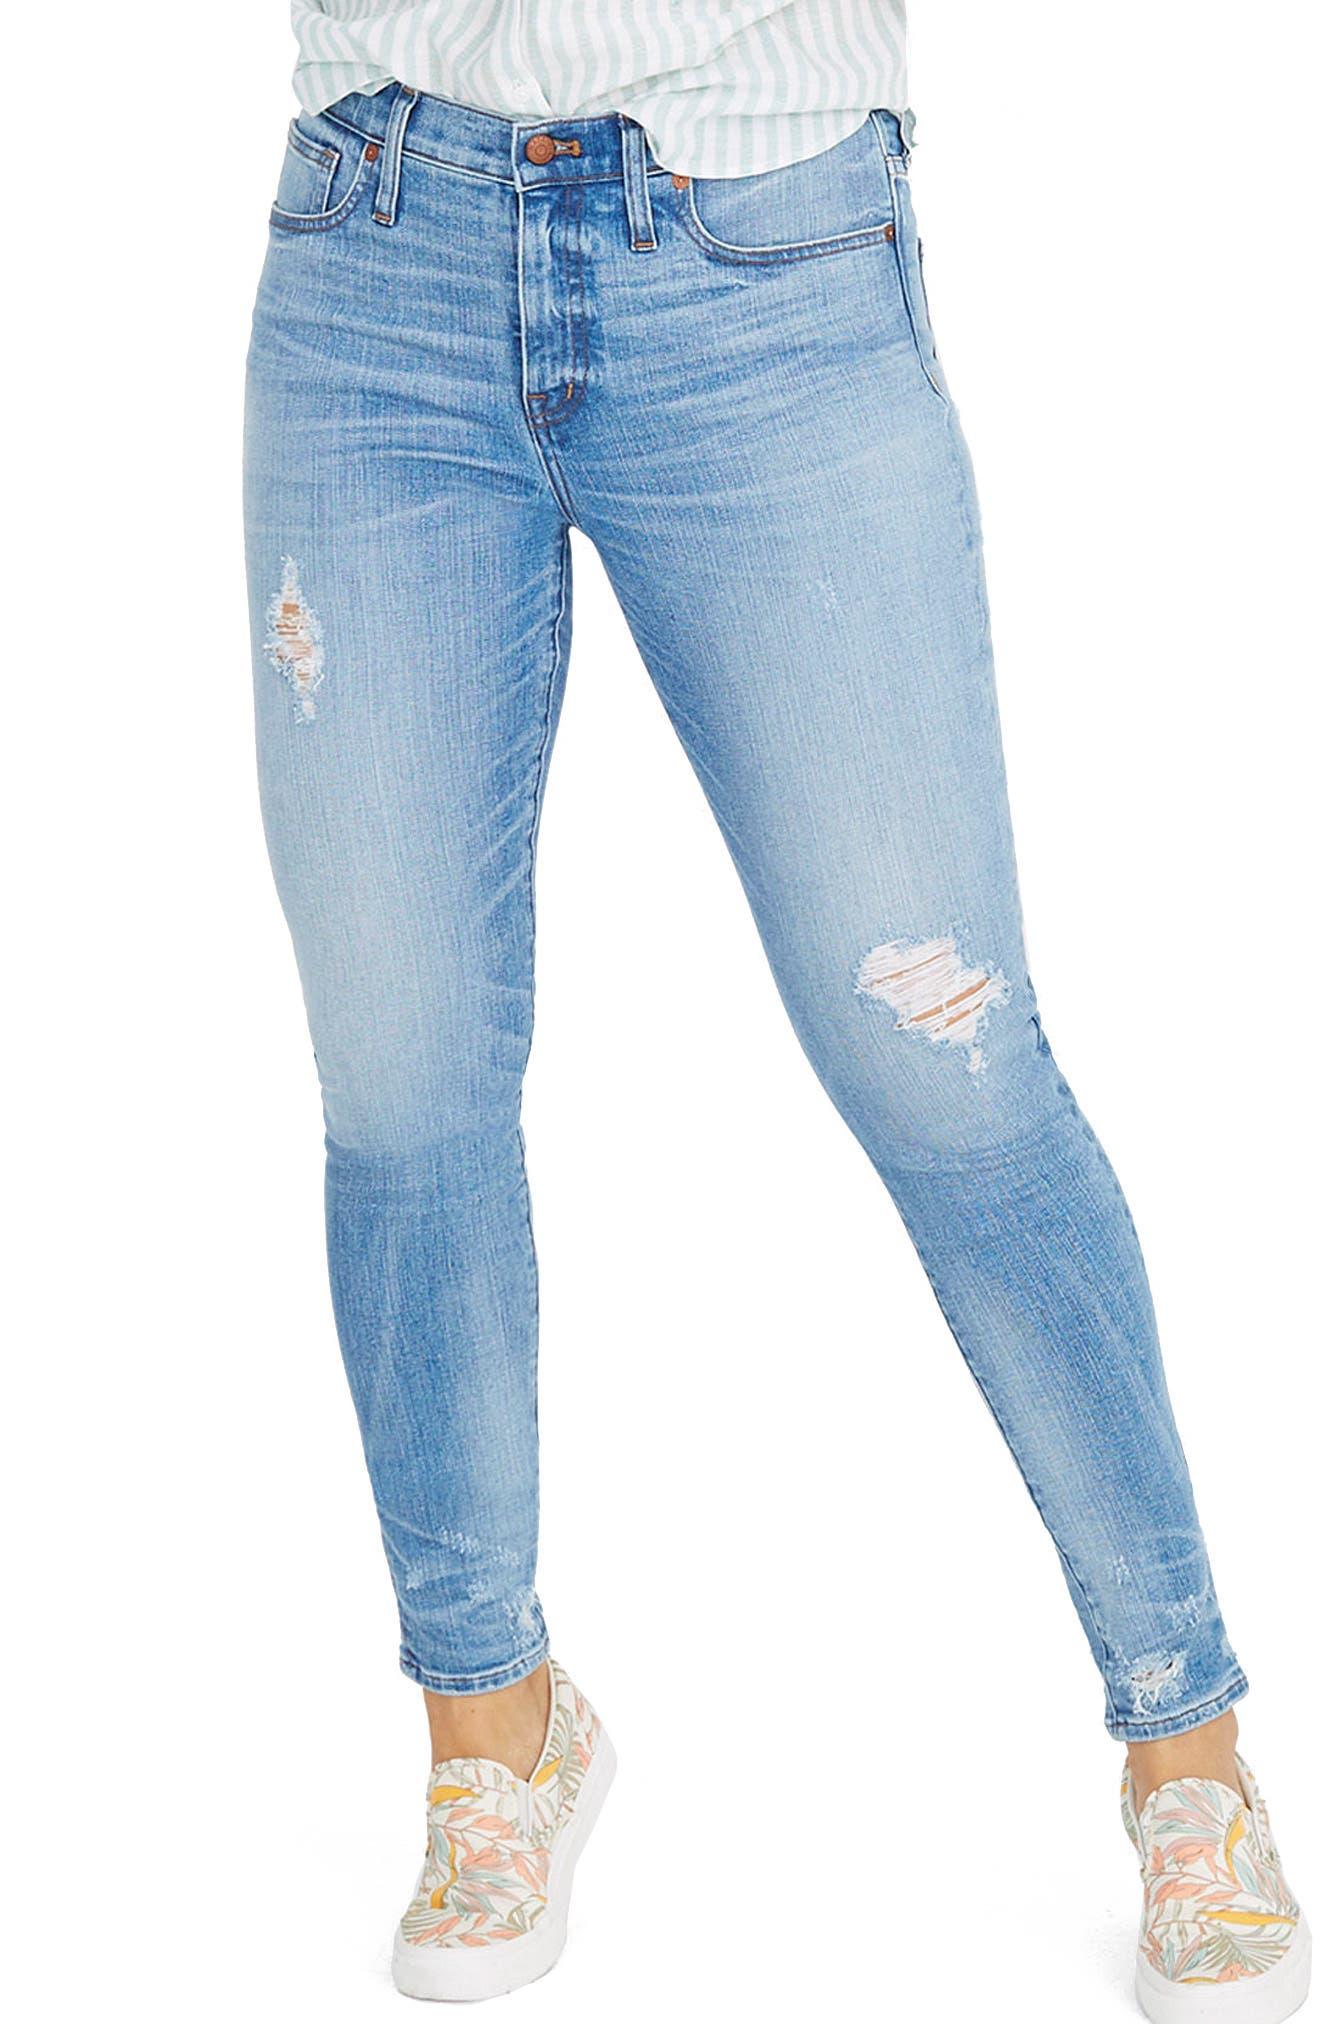 9-Inch Destructed Hem High Waist Skinny Jeans,                             Main thumbnail 1, color,                             Cliff Wash